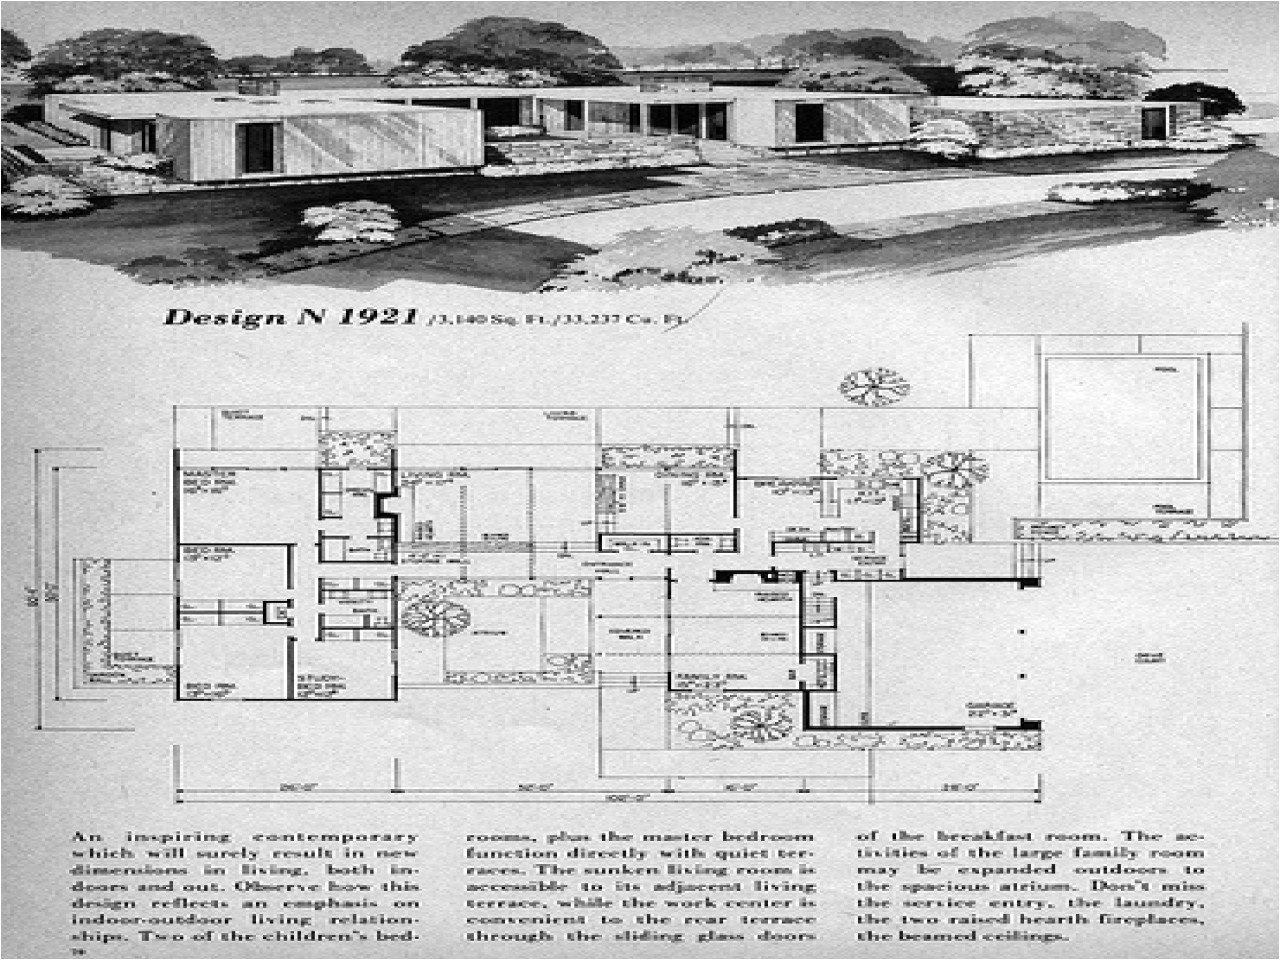 cc816a8ee42b4c29 prairie modern homes mid century modern house floor plan